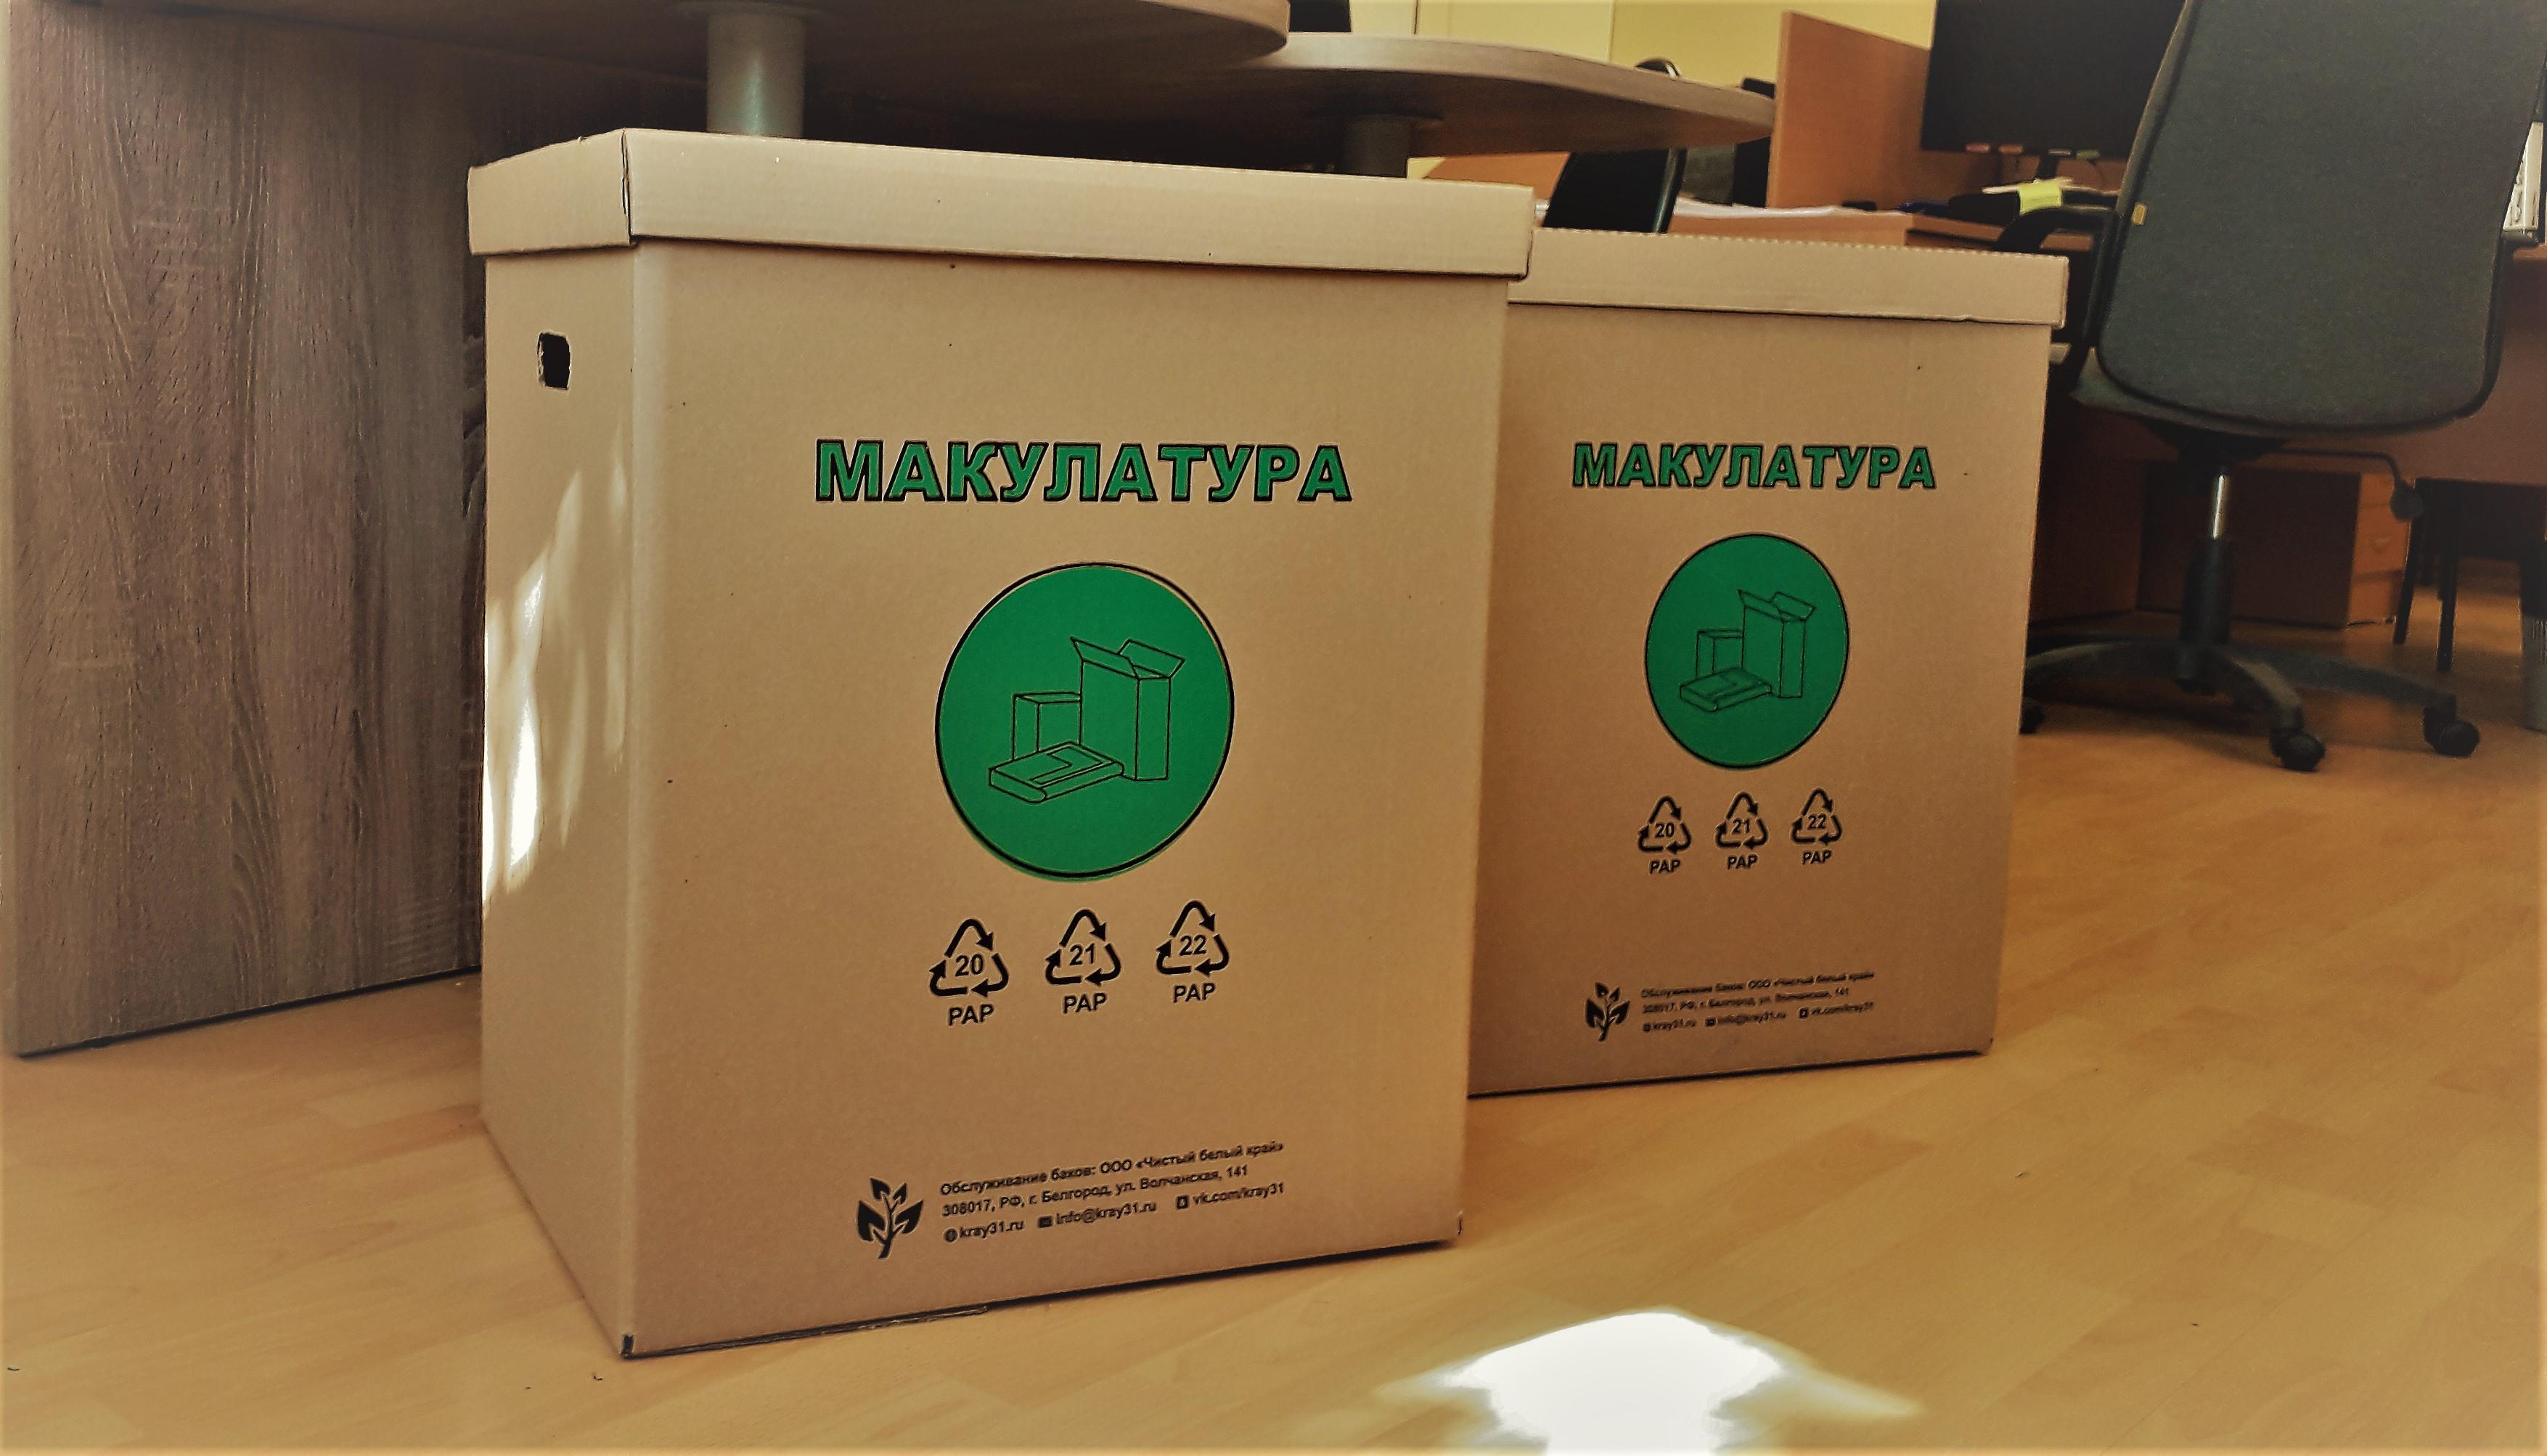 Контейнеры для сбора макулатуры. Чистый Белый Край